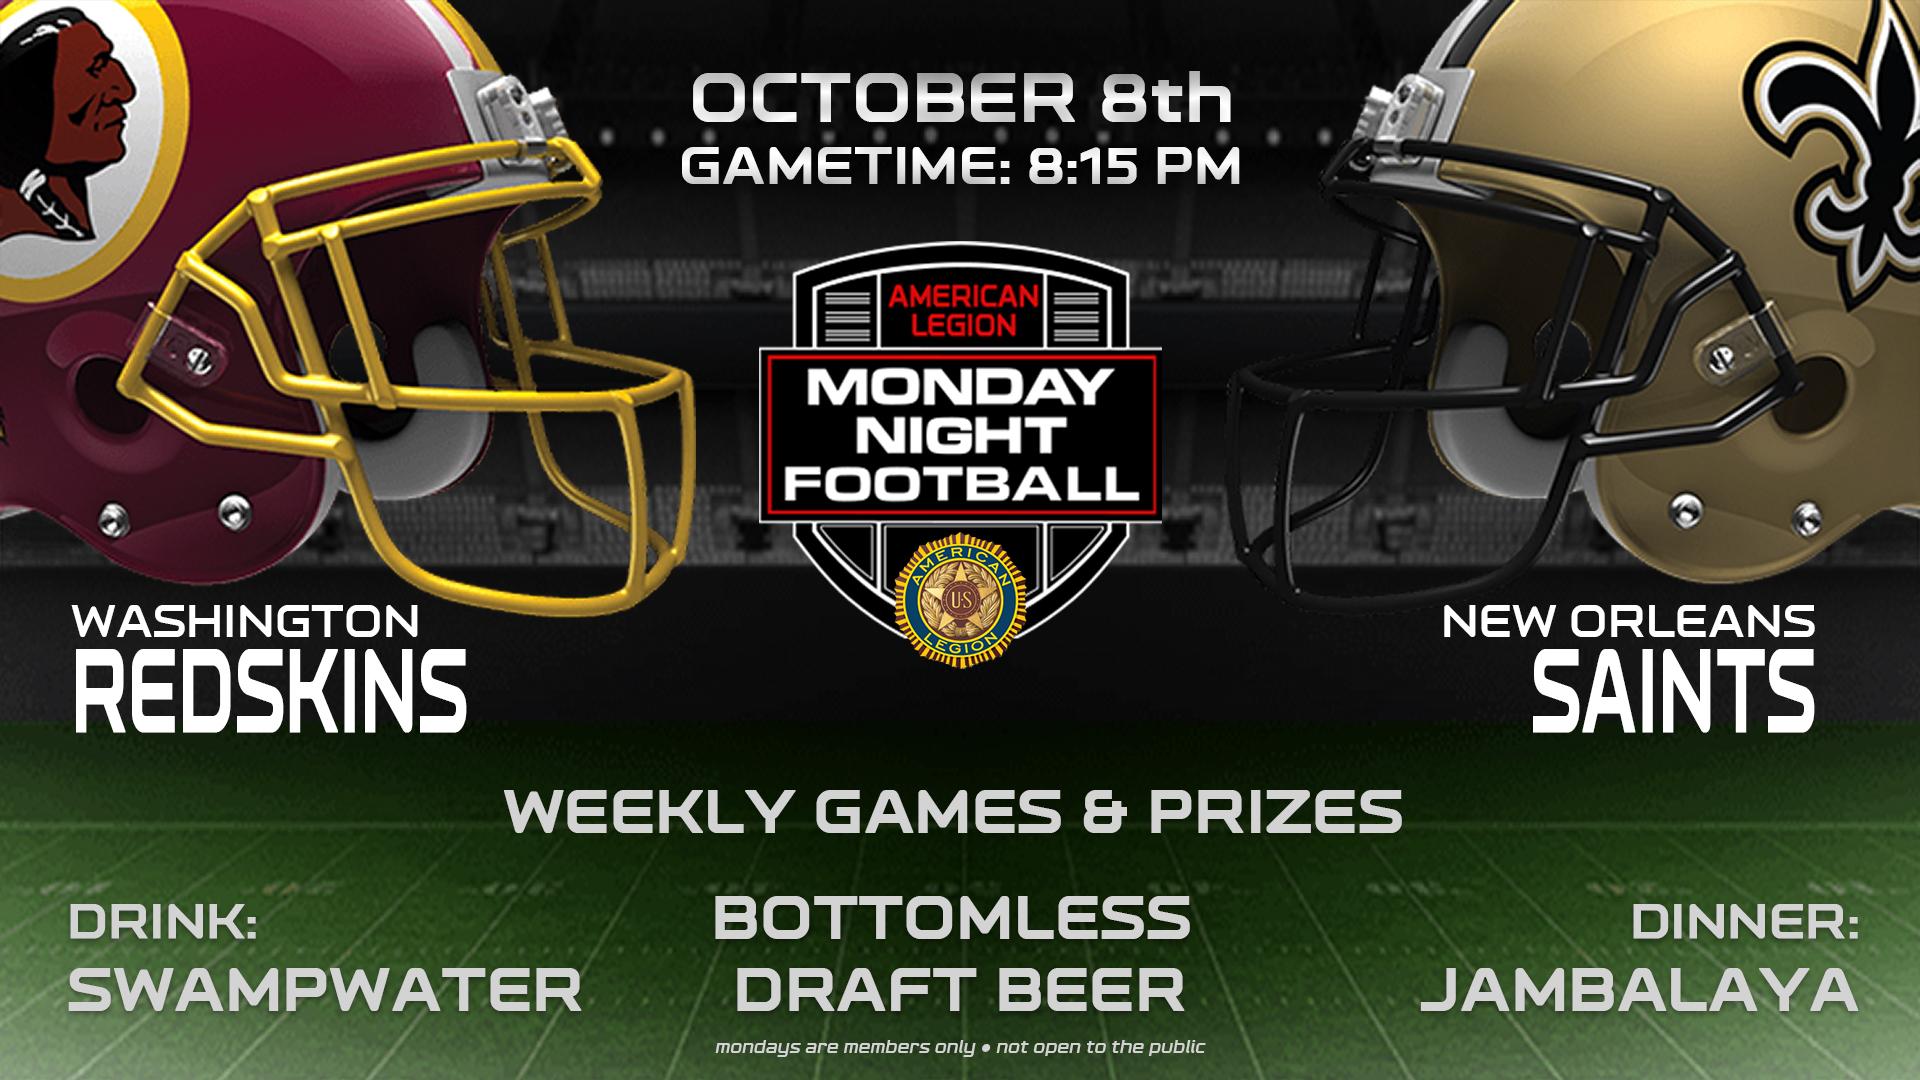 Monday Night Football Party